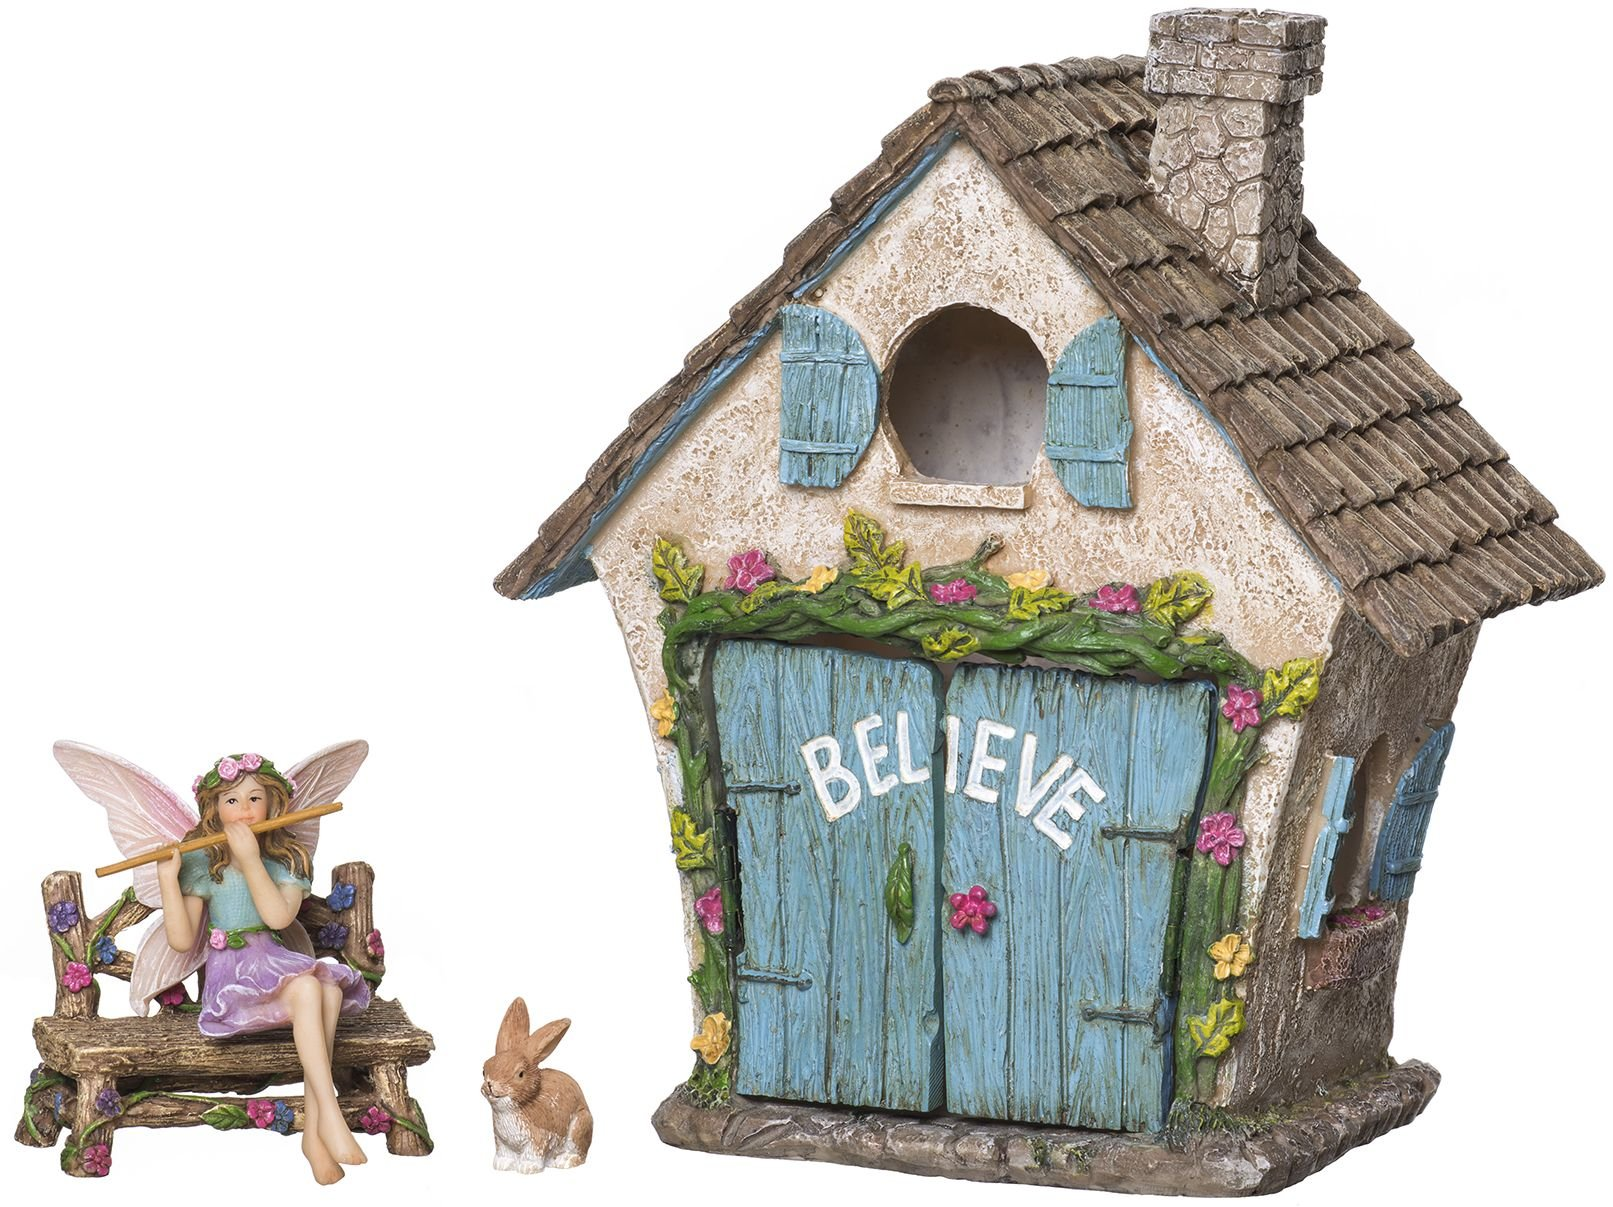 Garden house kit - Joykick Fairy Garden House Kit With Miniature Fairy Figurine And Accessories Set Of 4 Pcs